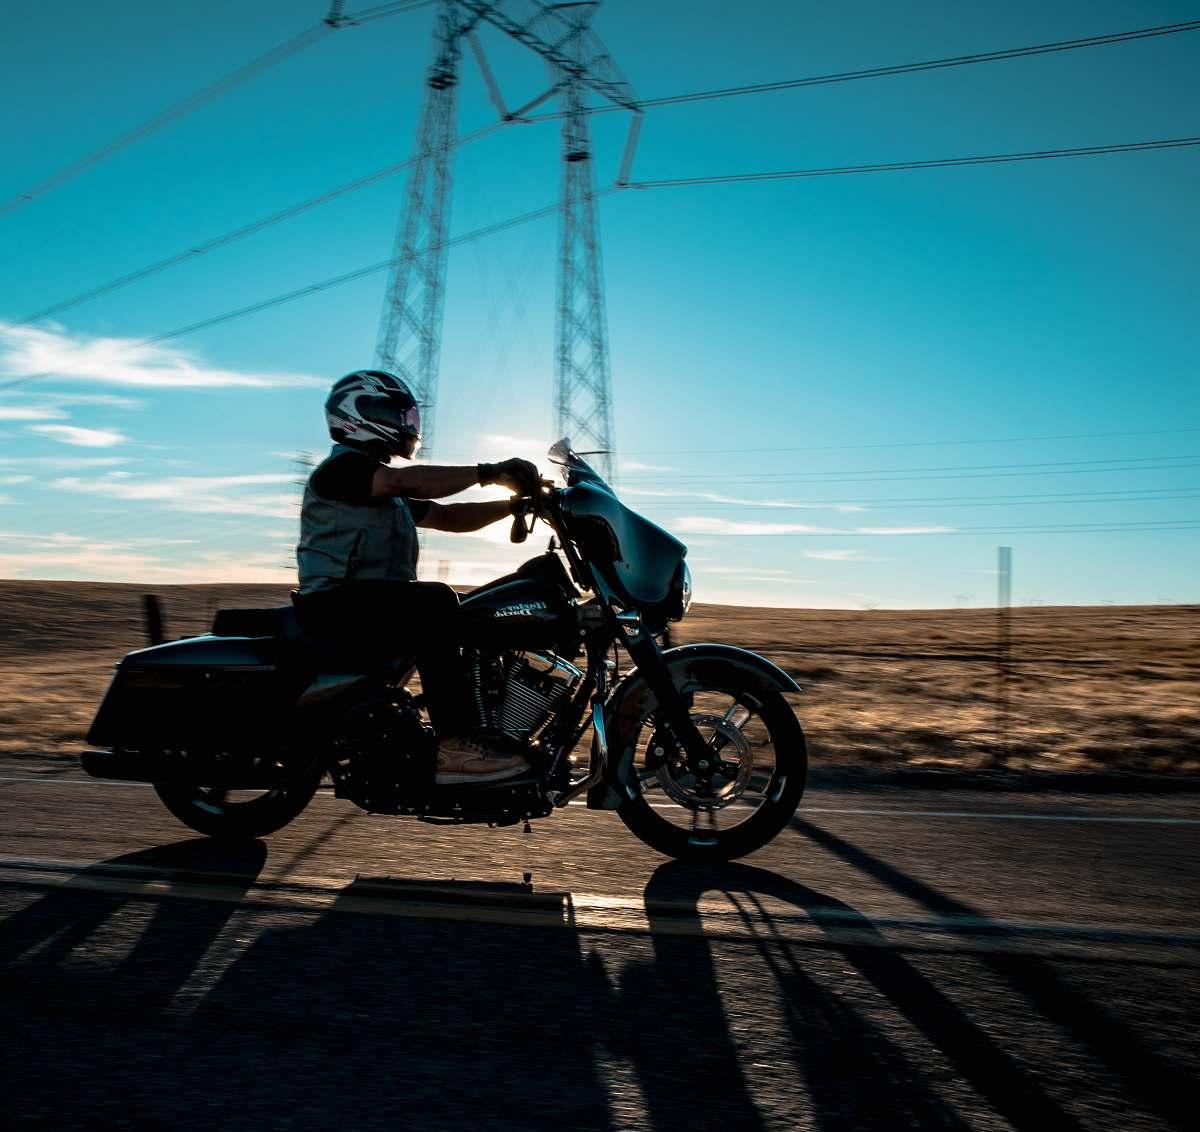 stock photos free  of motorcycle black touring motorcycle vehicle